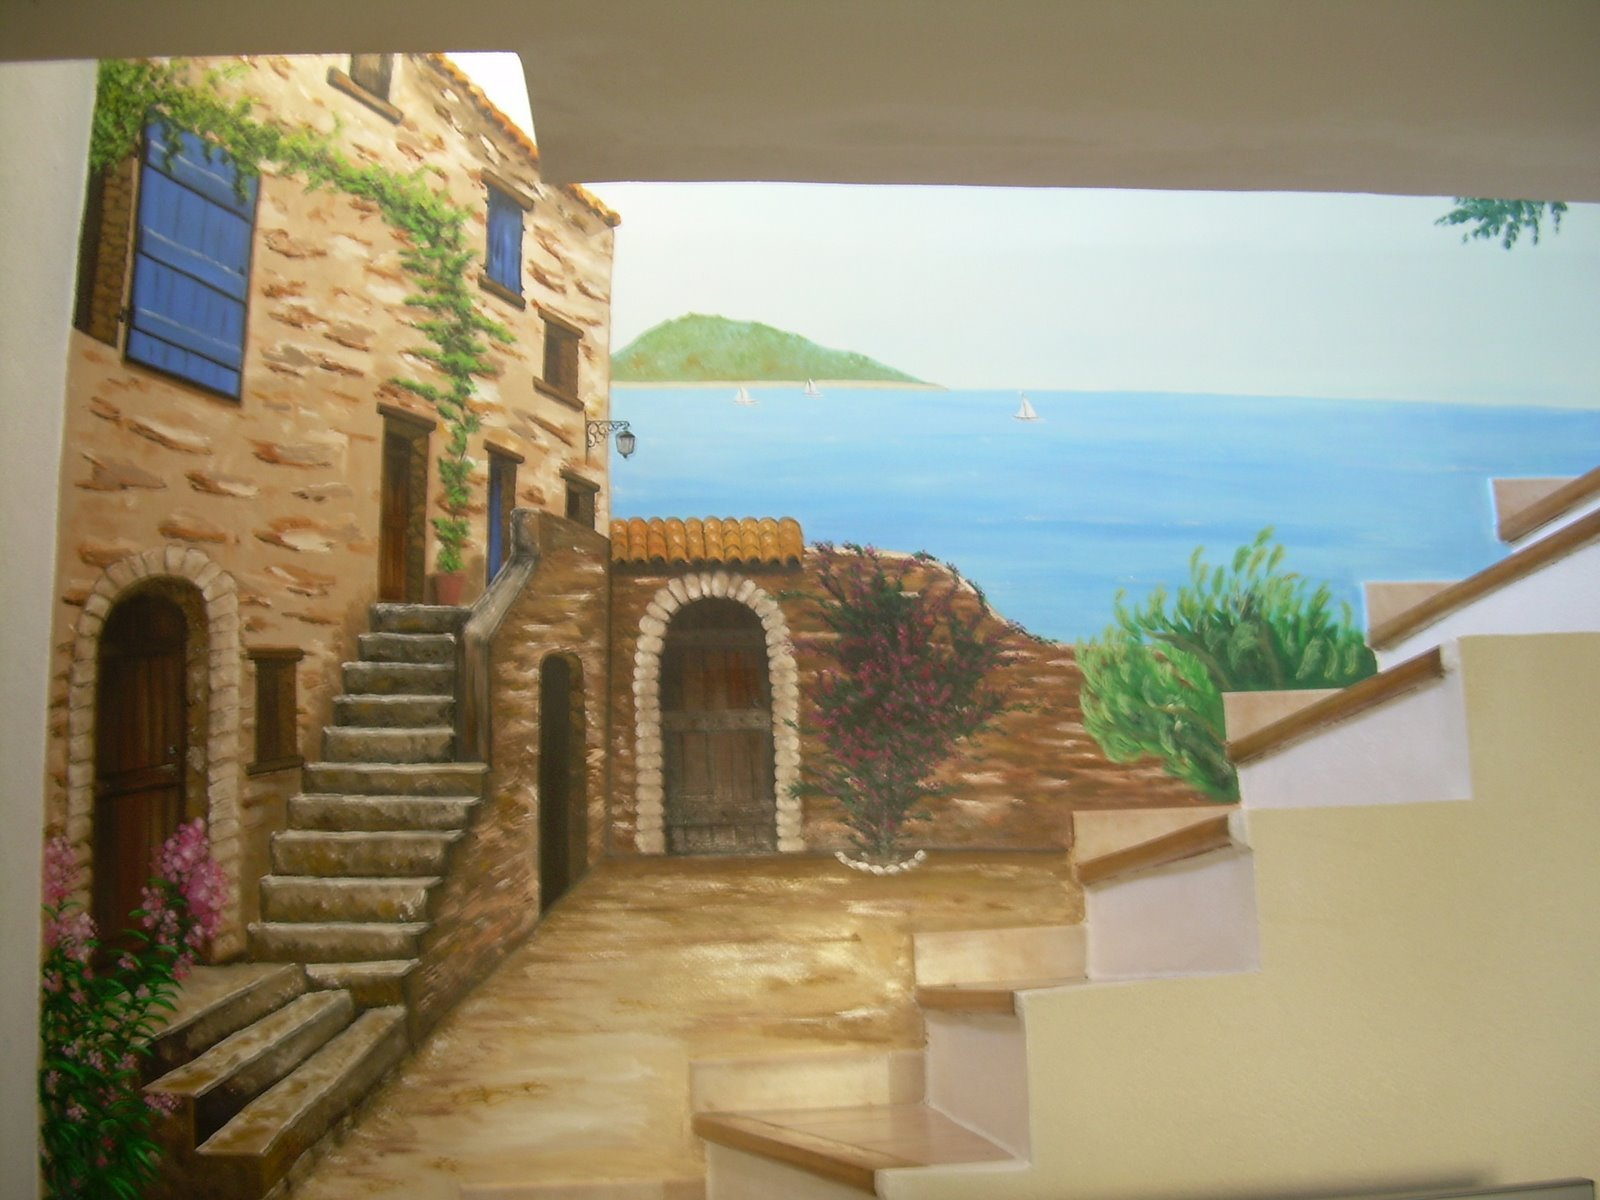 Peinture fresque murale for Peinture argentee murale